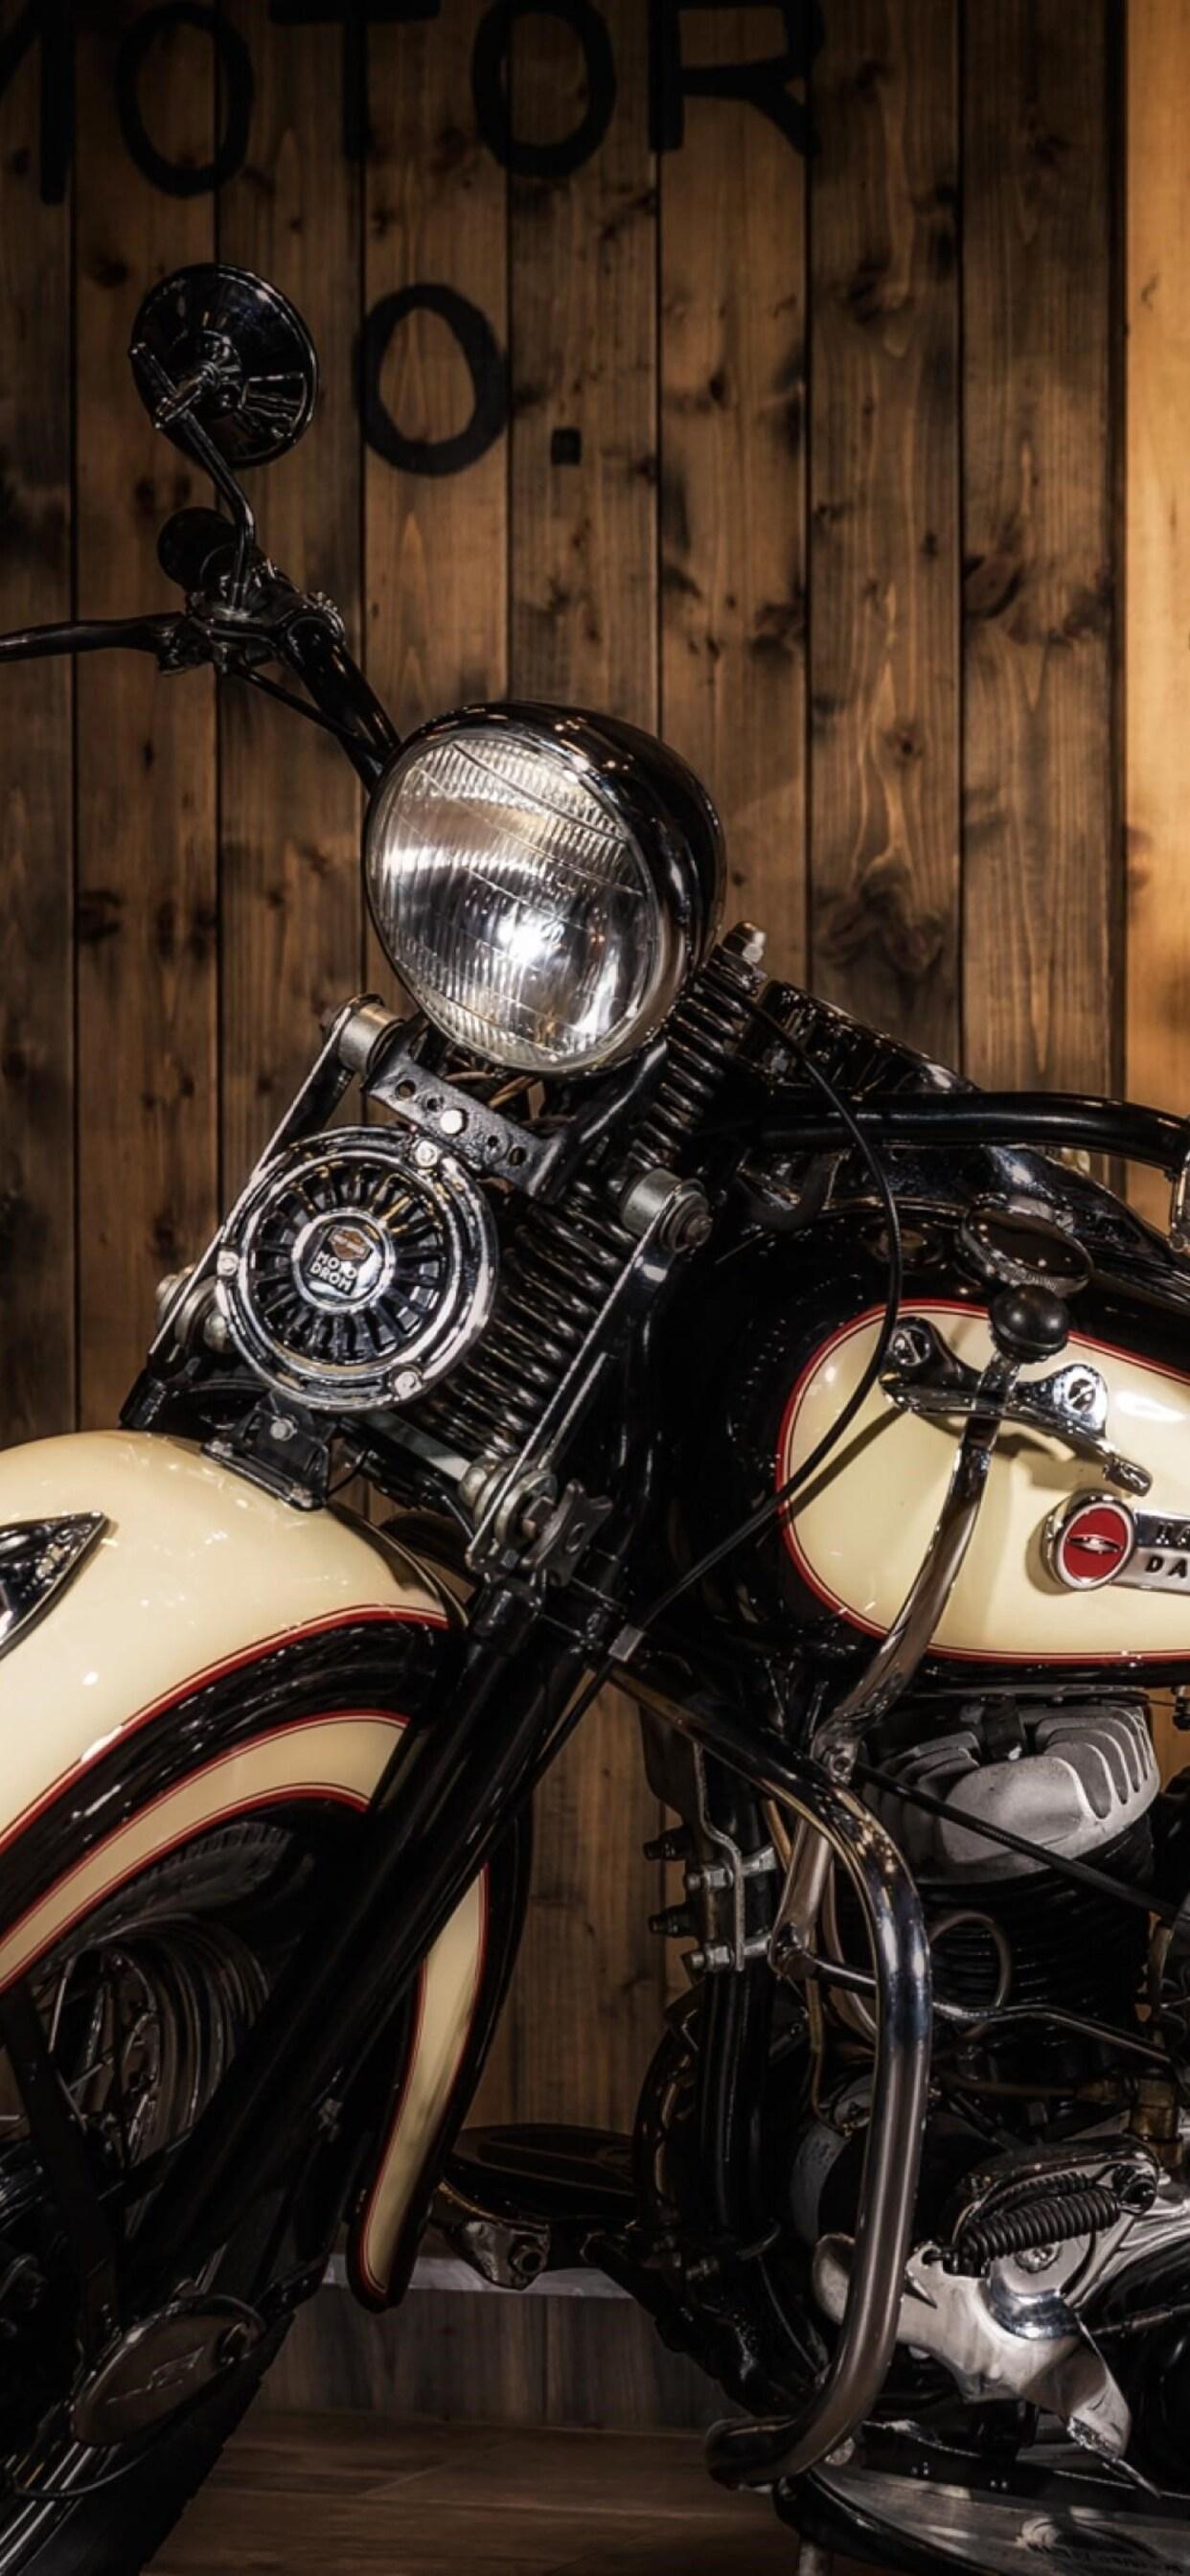 1242x2688 Harley Davidson Iphone Xs Max Hd 4k Wallpapers